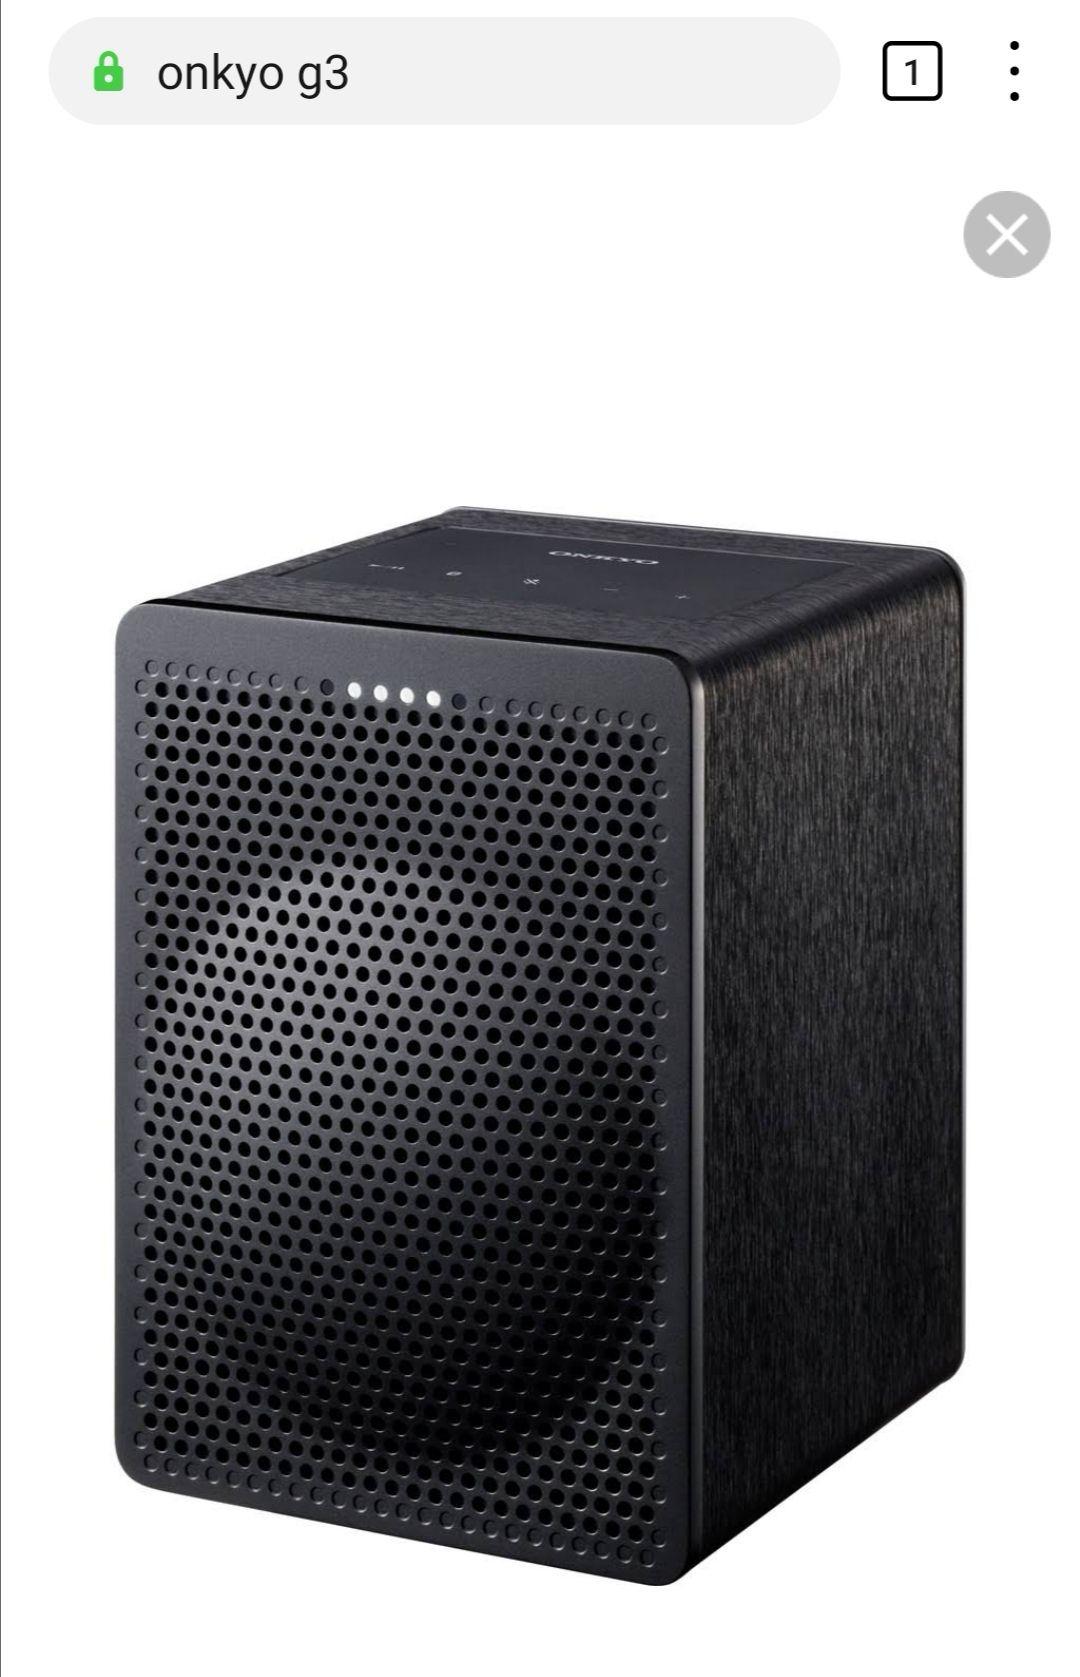 [Grensdeal Duitsland] Onkyo G3 smart speaker